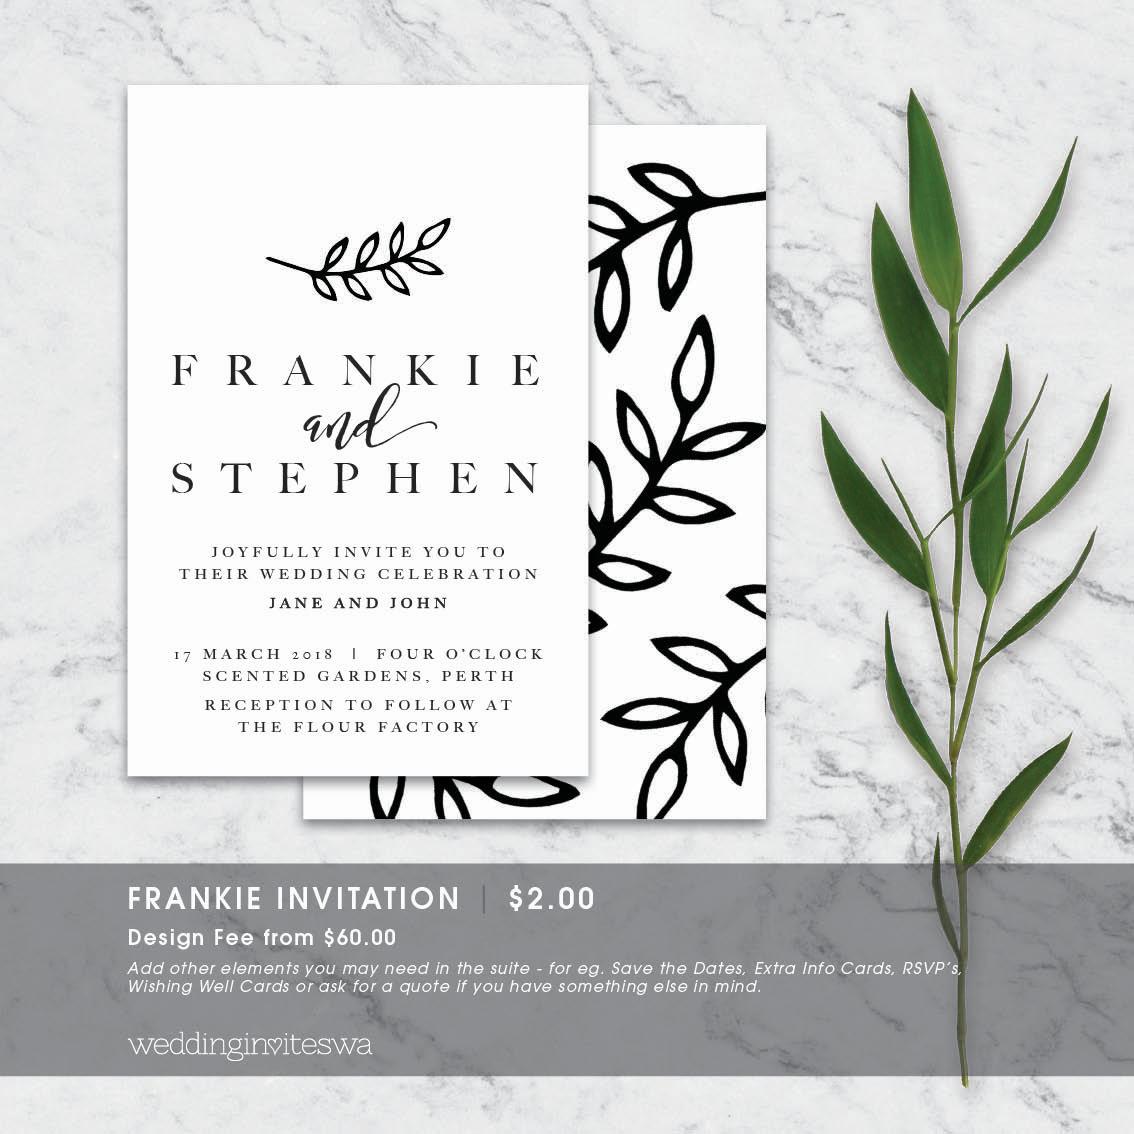 FRANKIE_invite